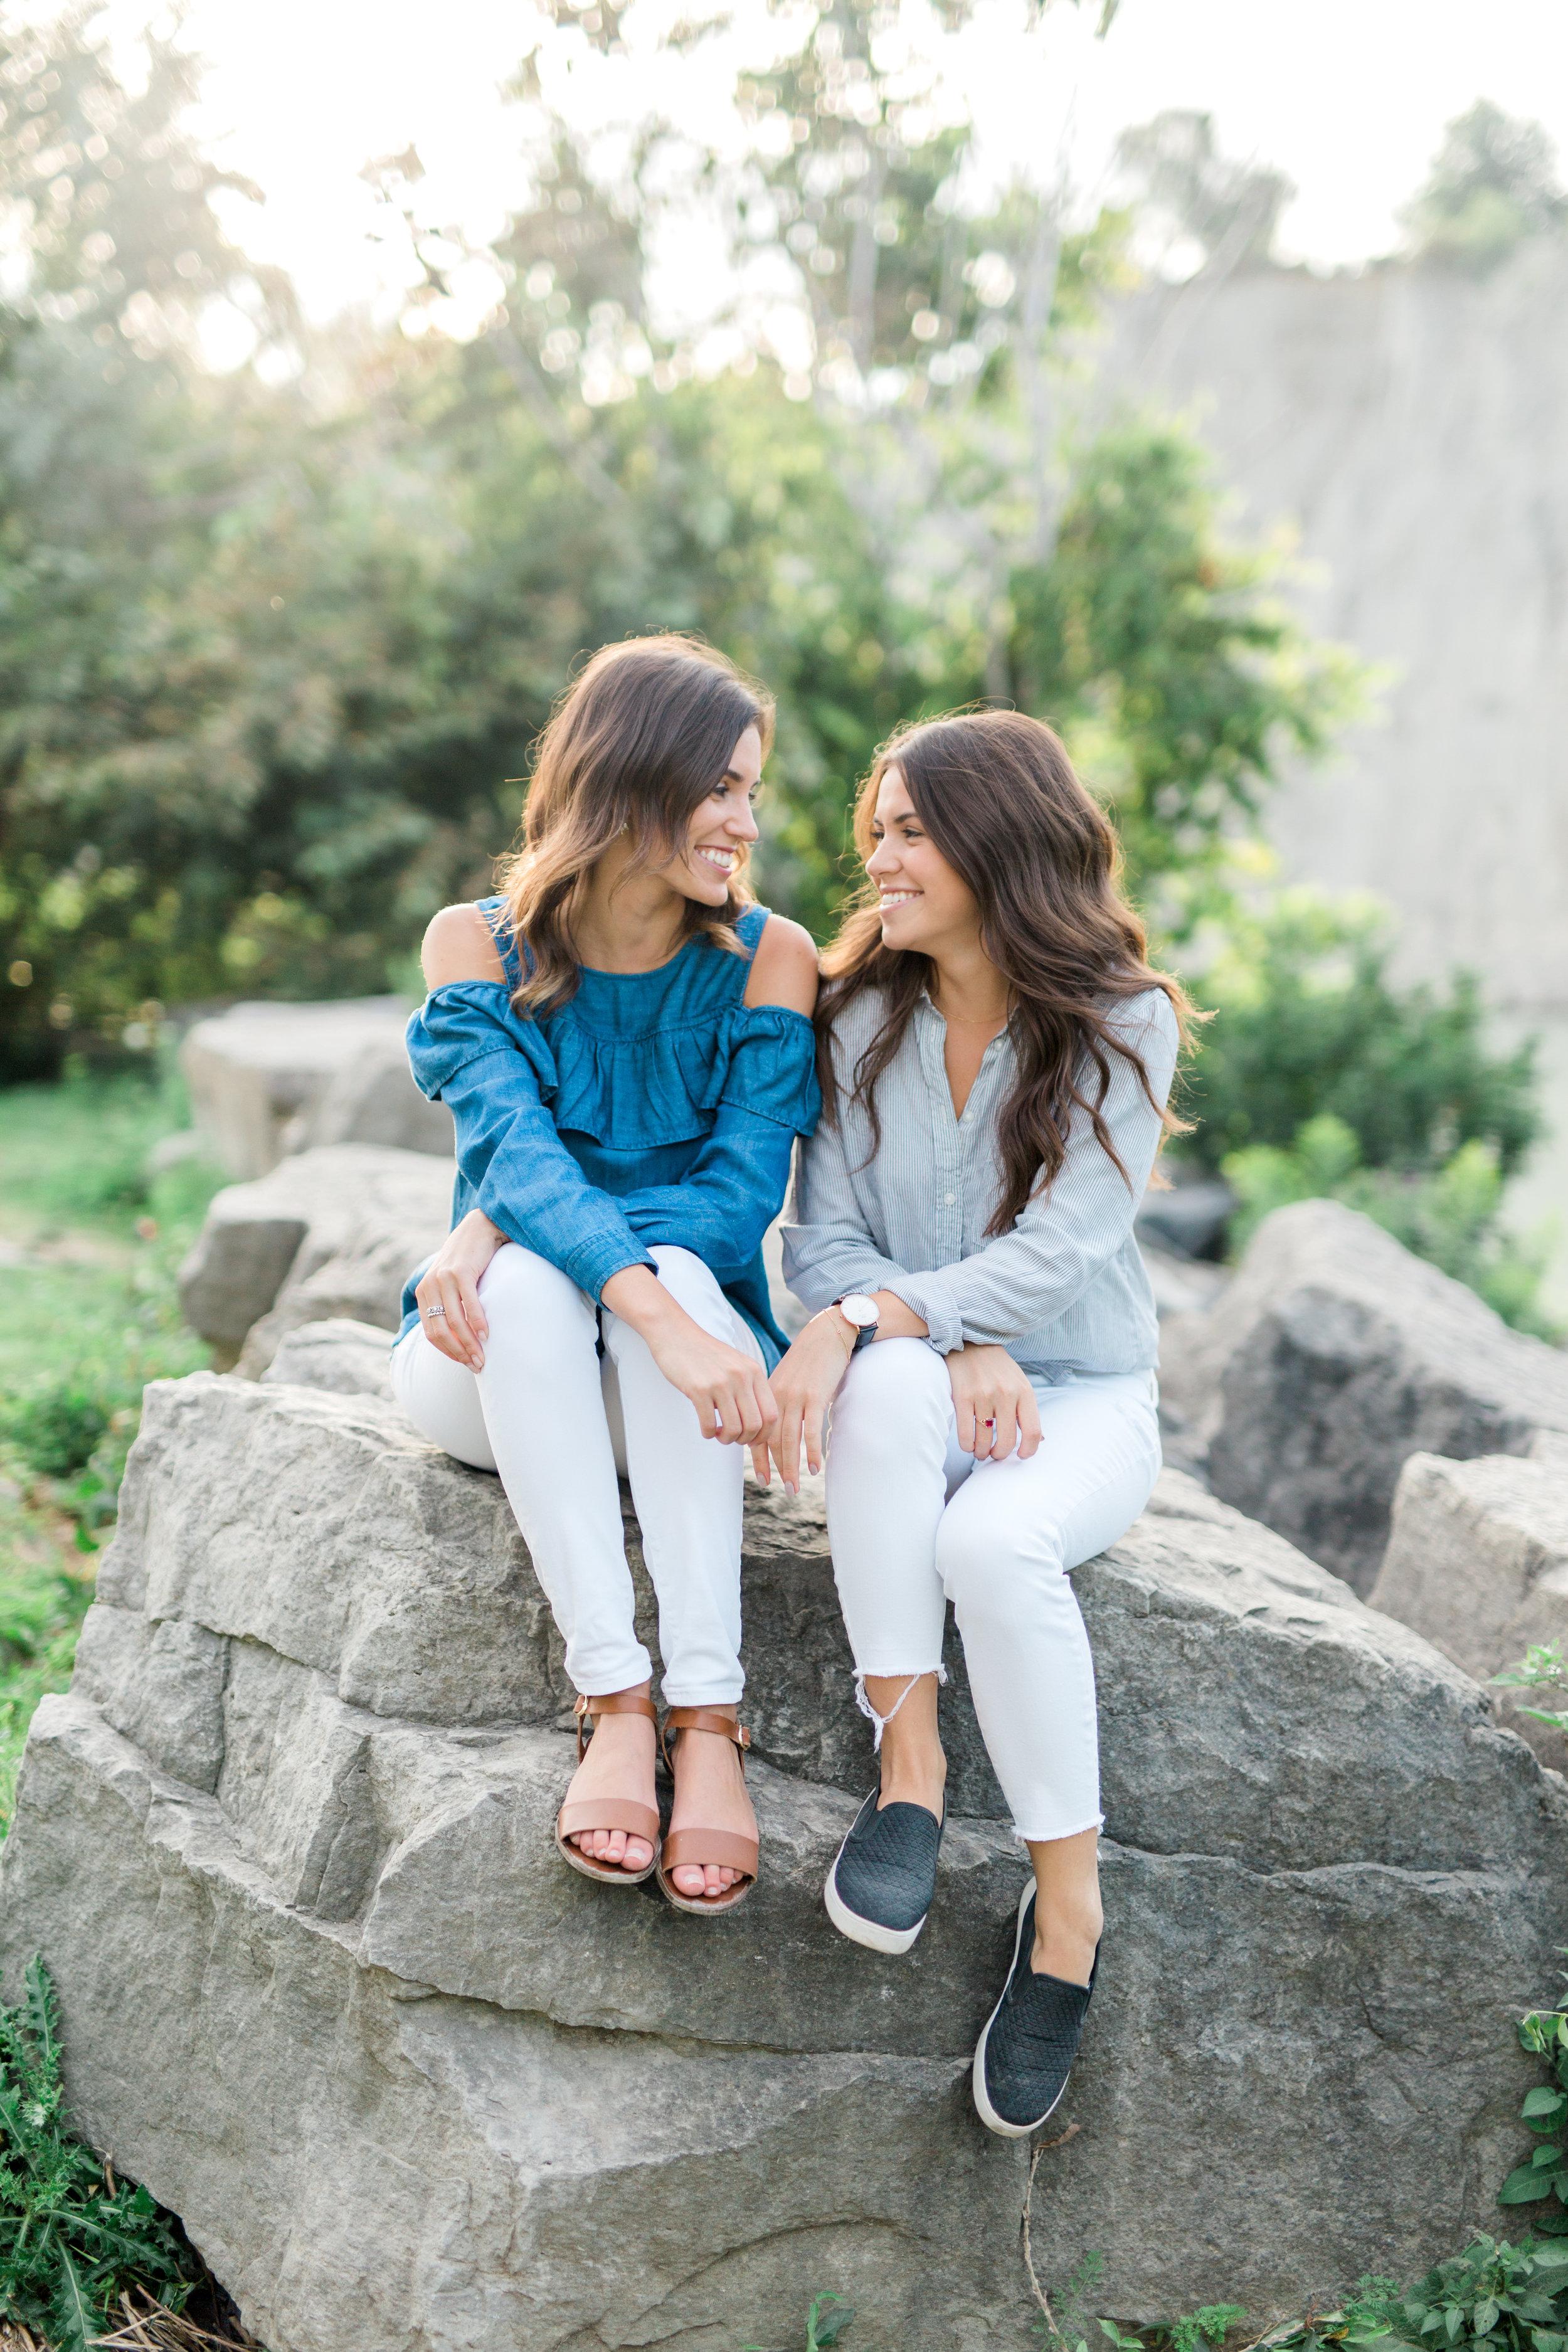 Danielle-Giroux-Amir-Golbazi-Genua-Family-Photography-Scarborough-Bluffs-9001.jpg